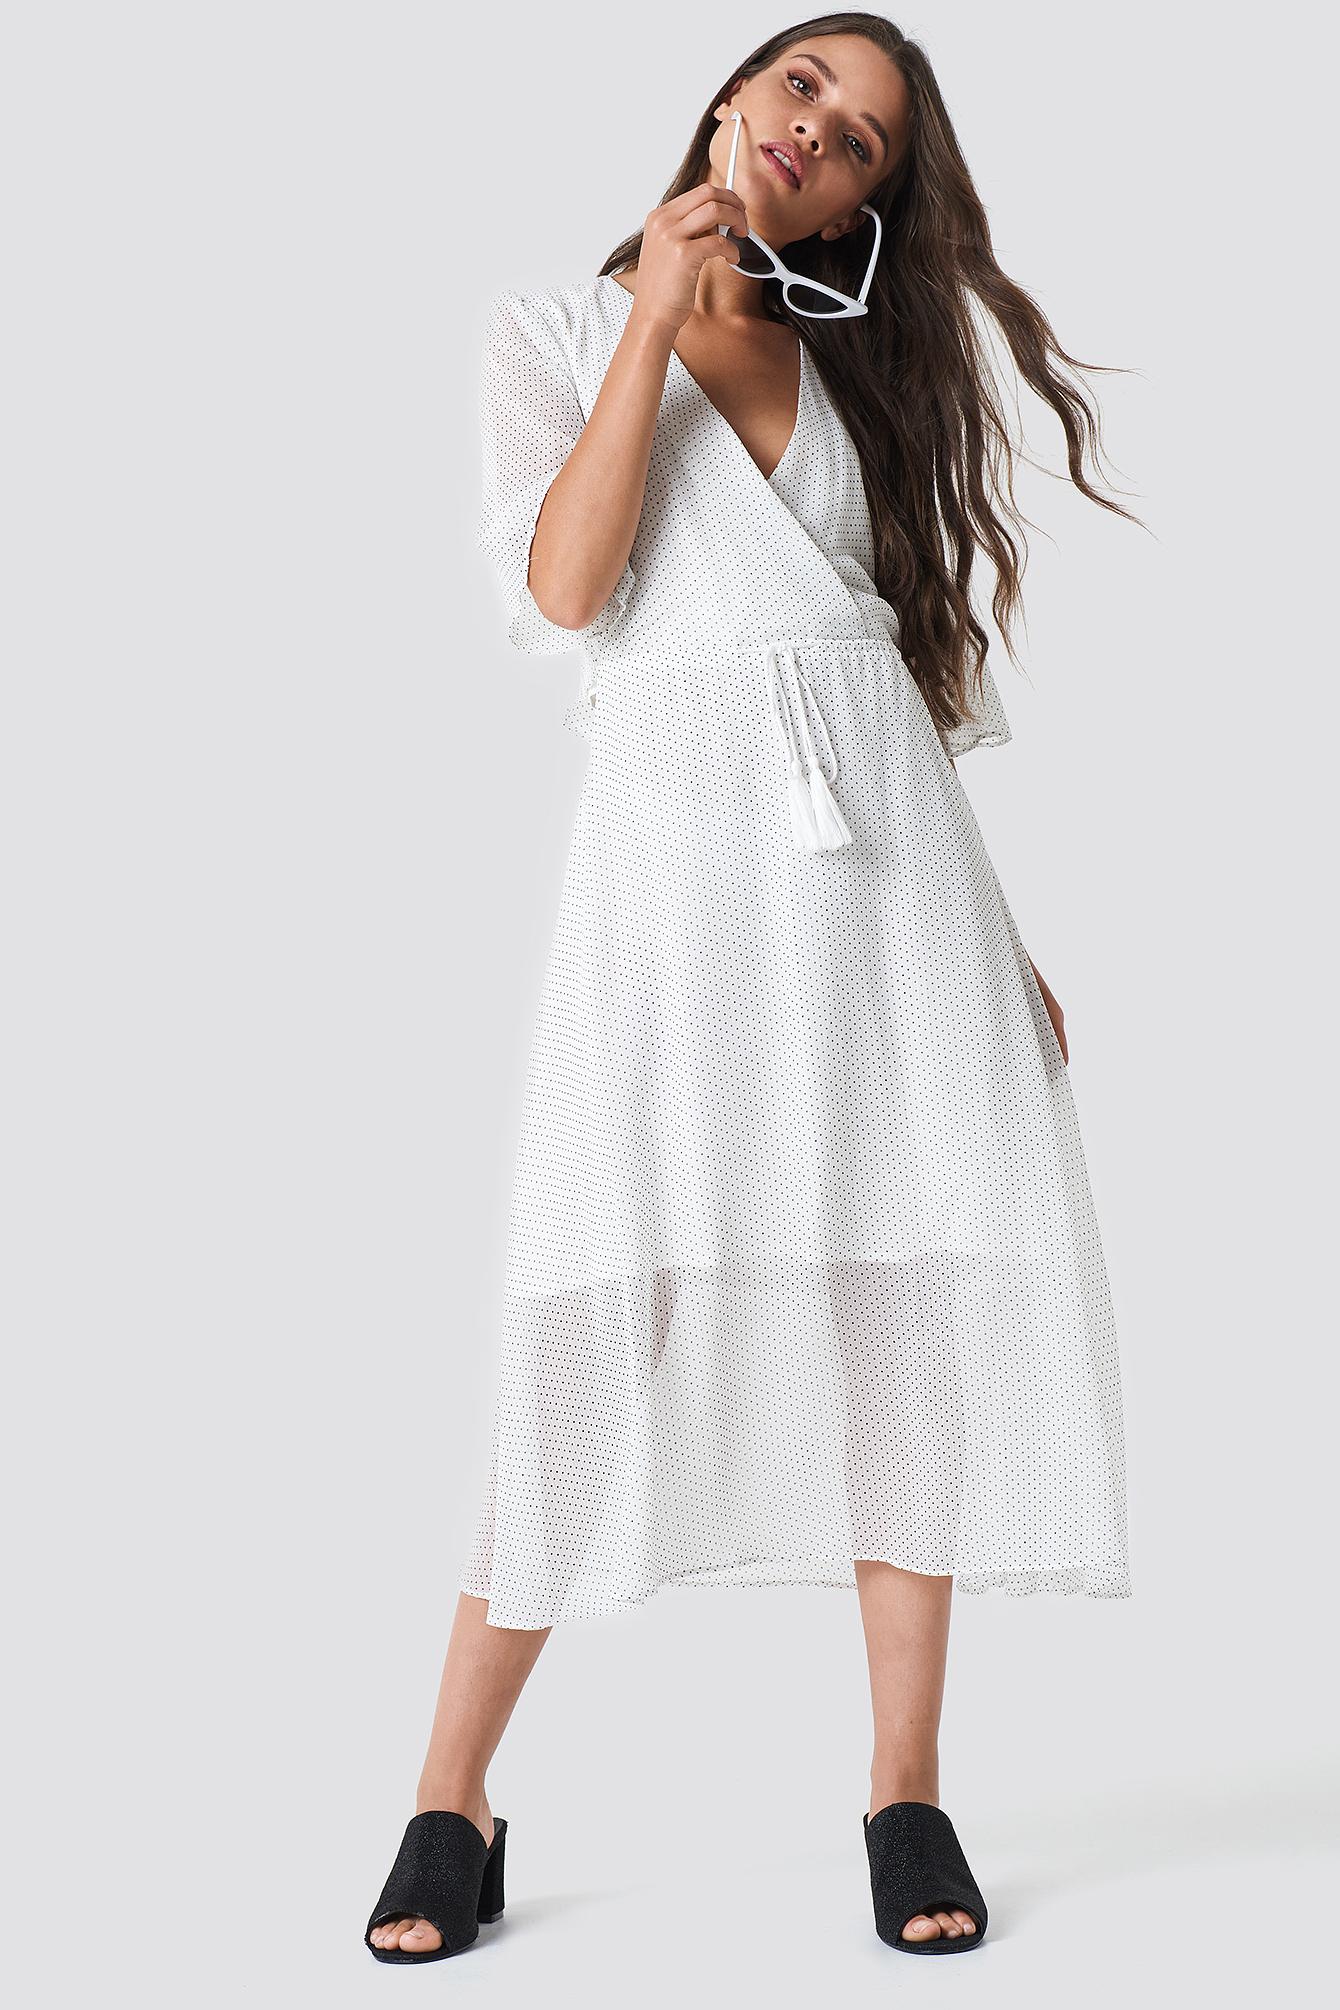 MOVES HUNEA DRESS - WHITE